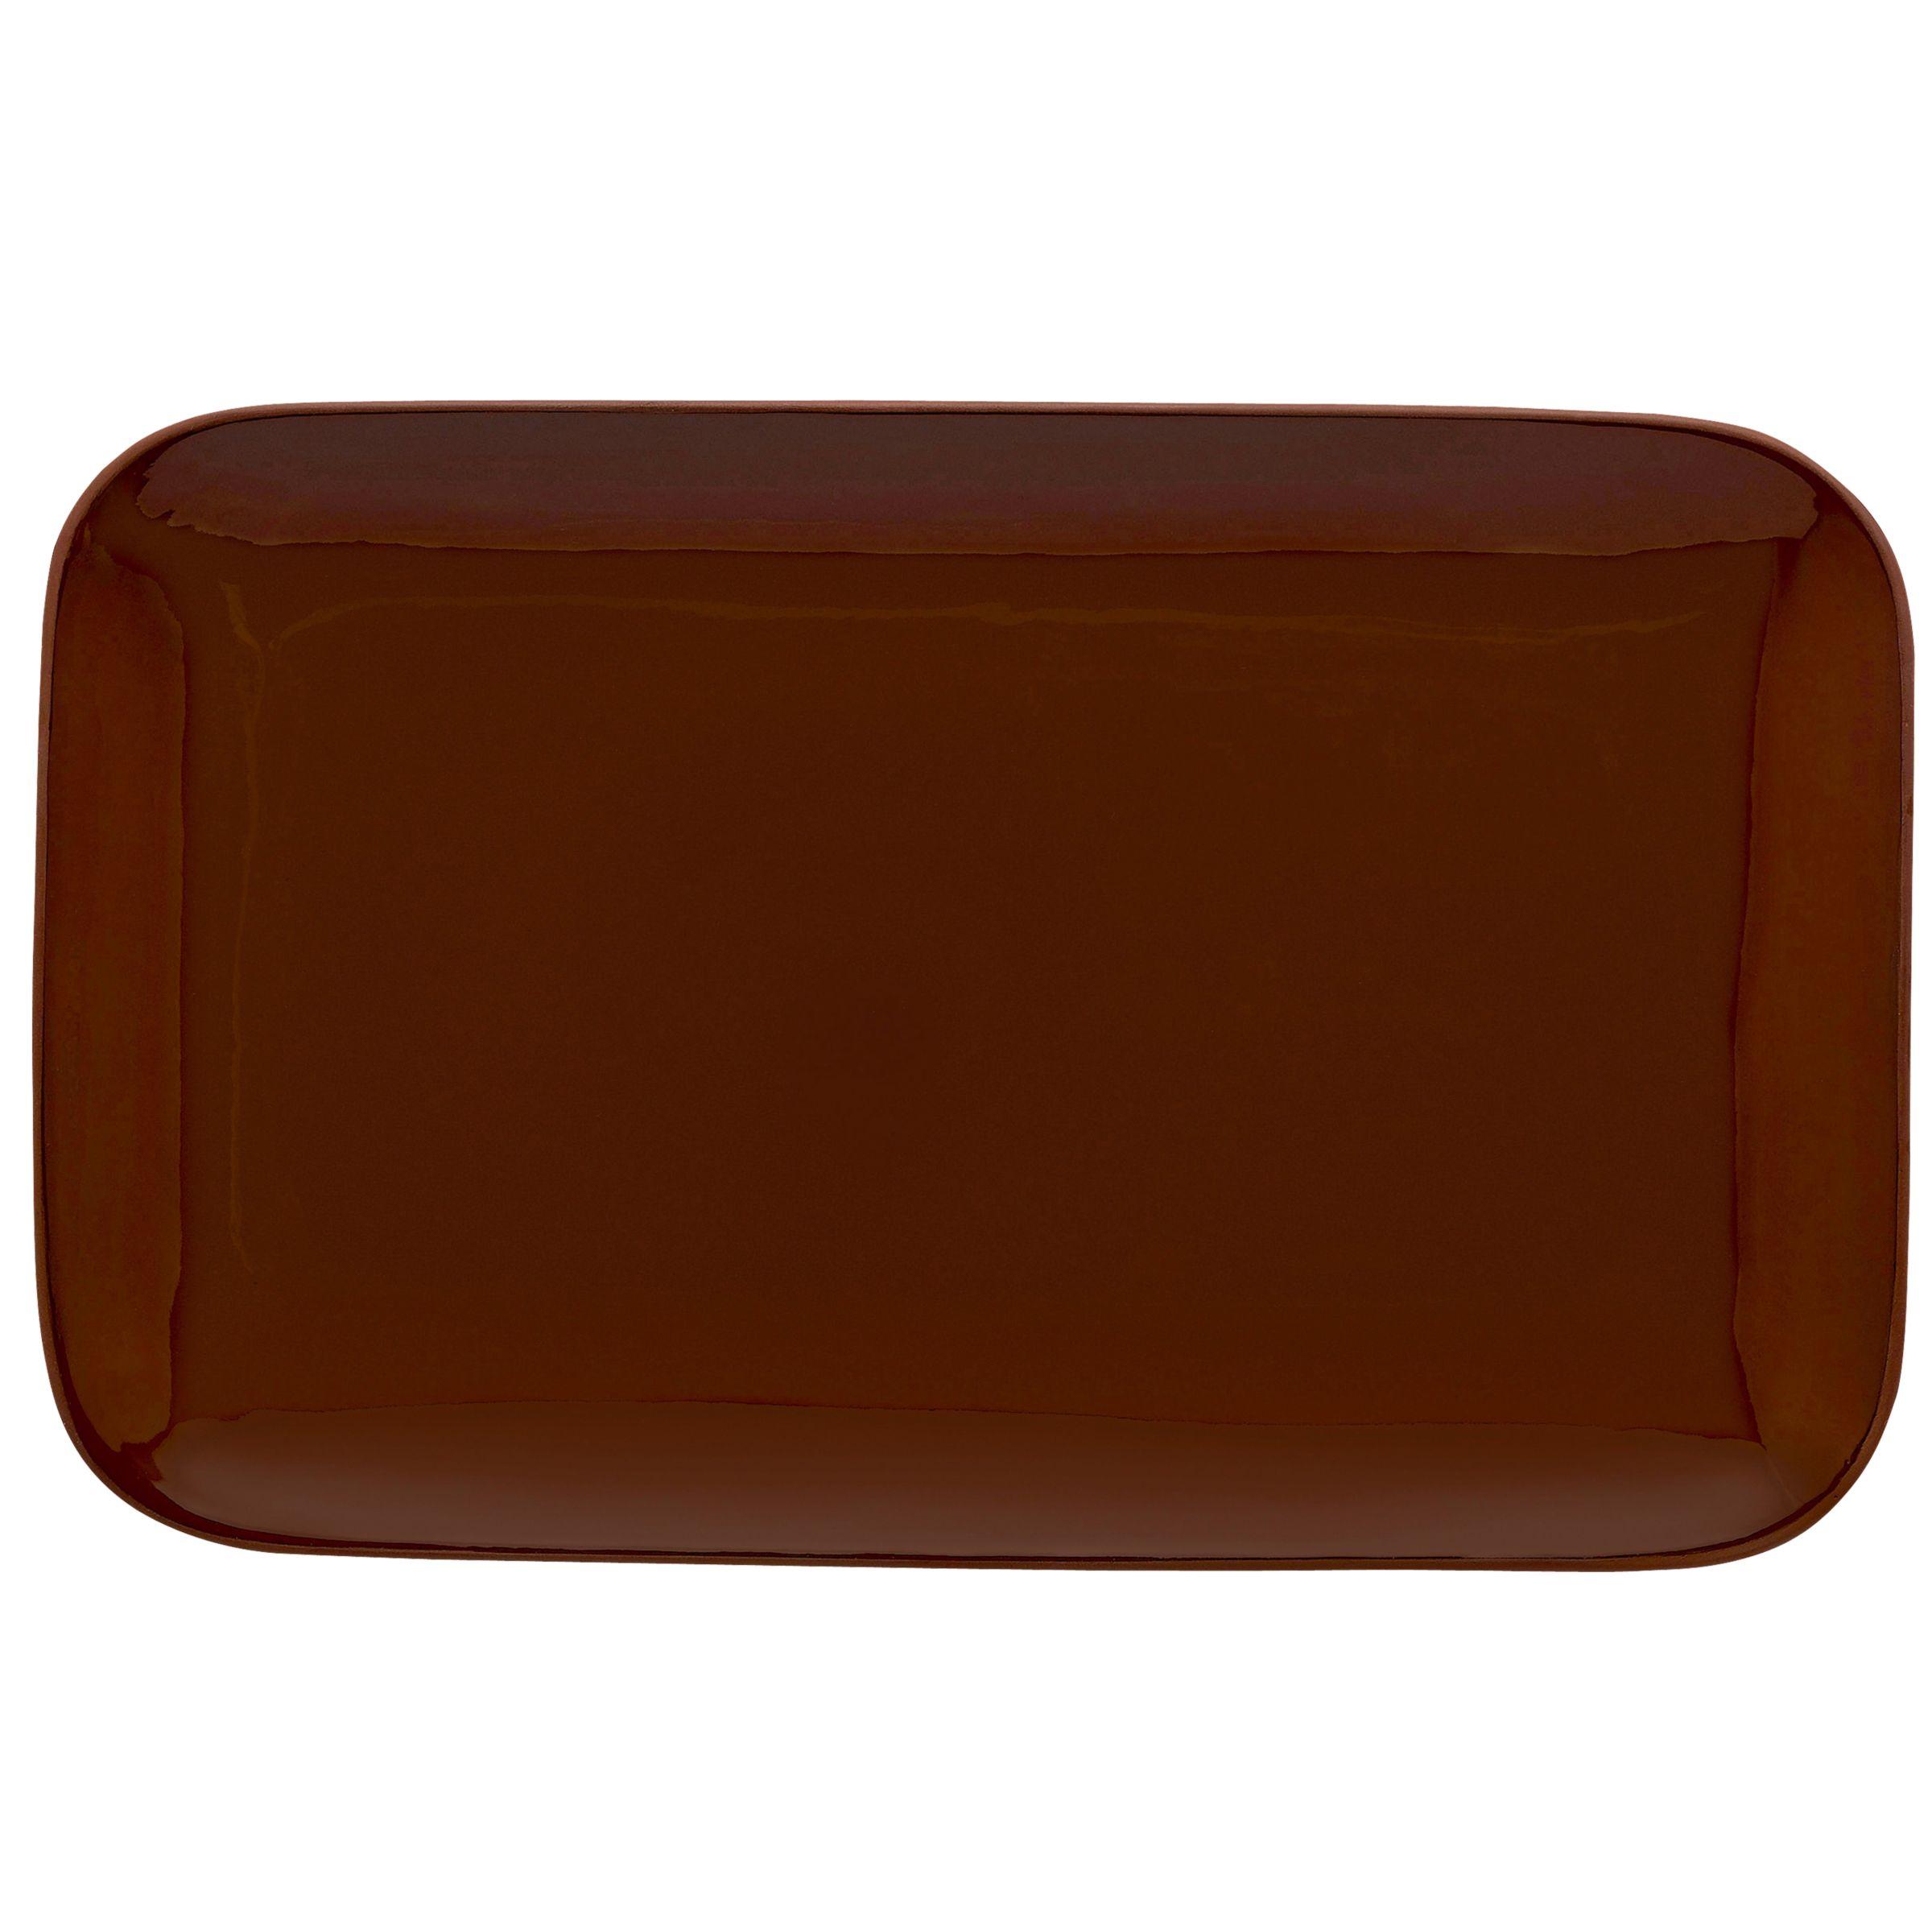 Royal Doulton Royal Doulton Olio Small Serve Platter, Red